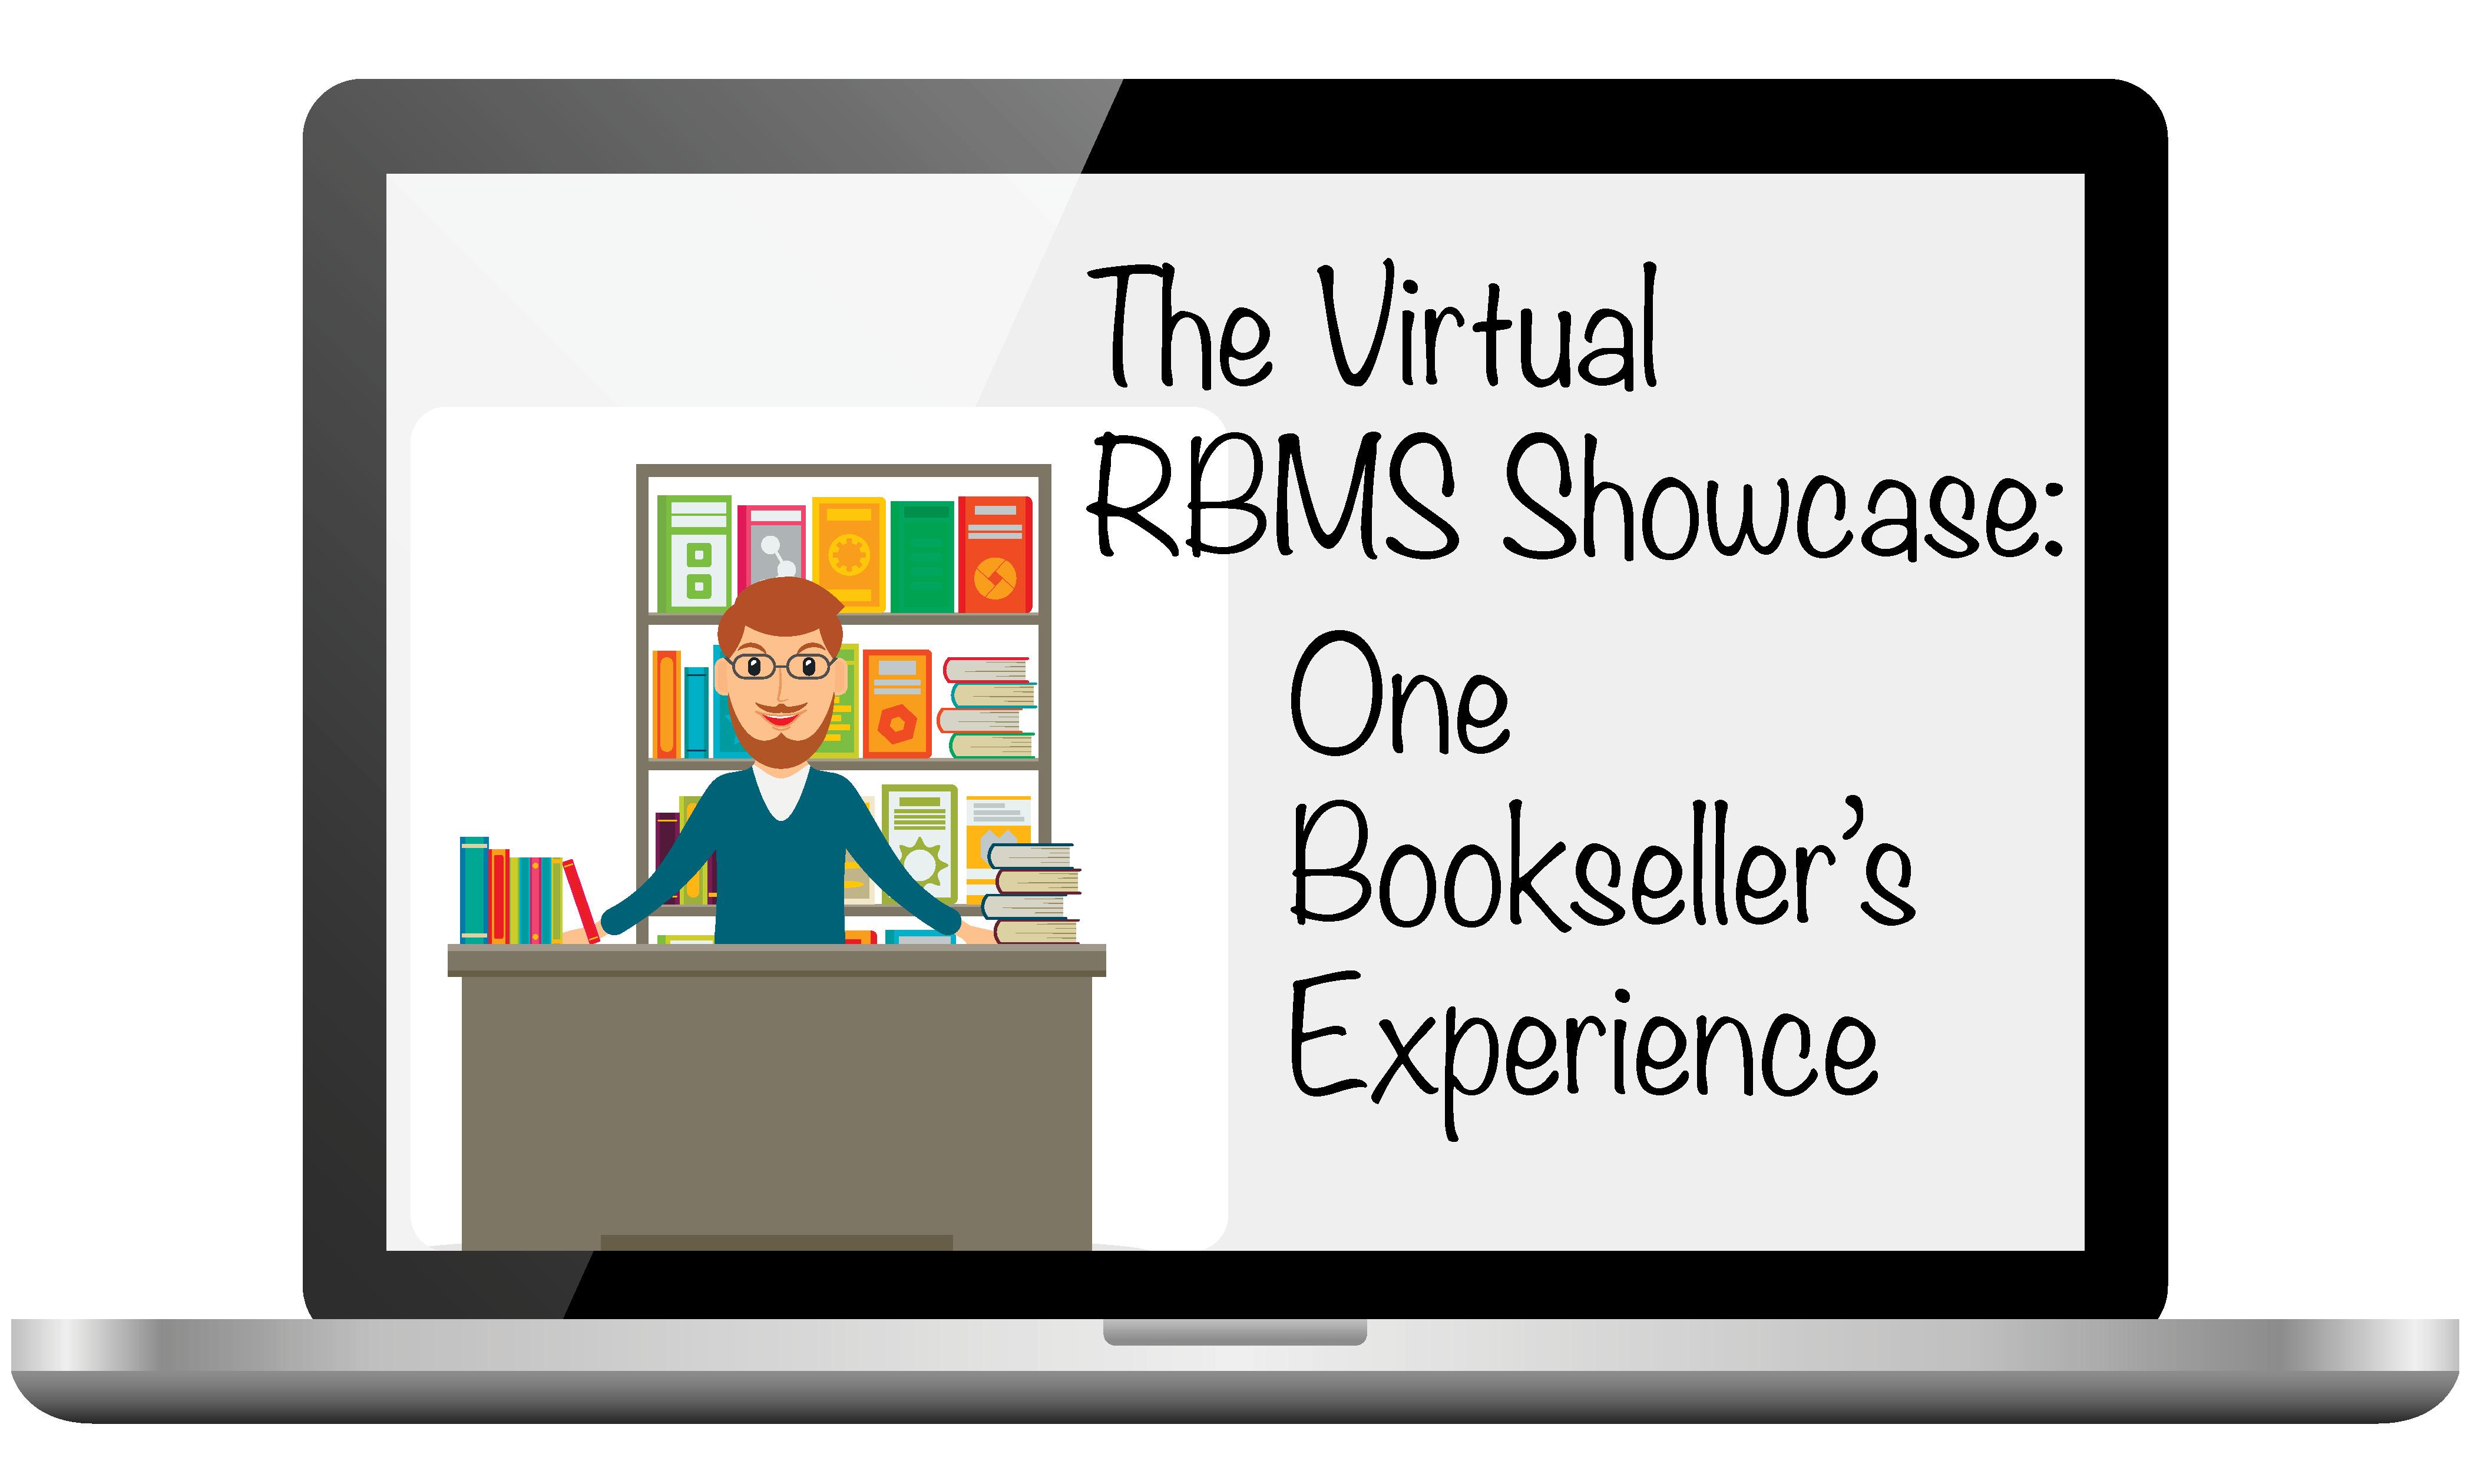 RBMS image